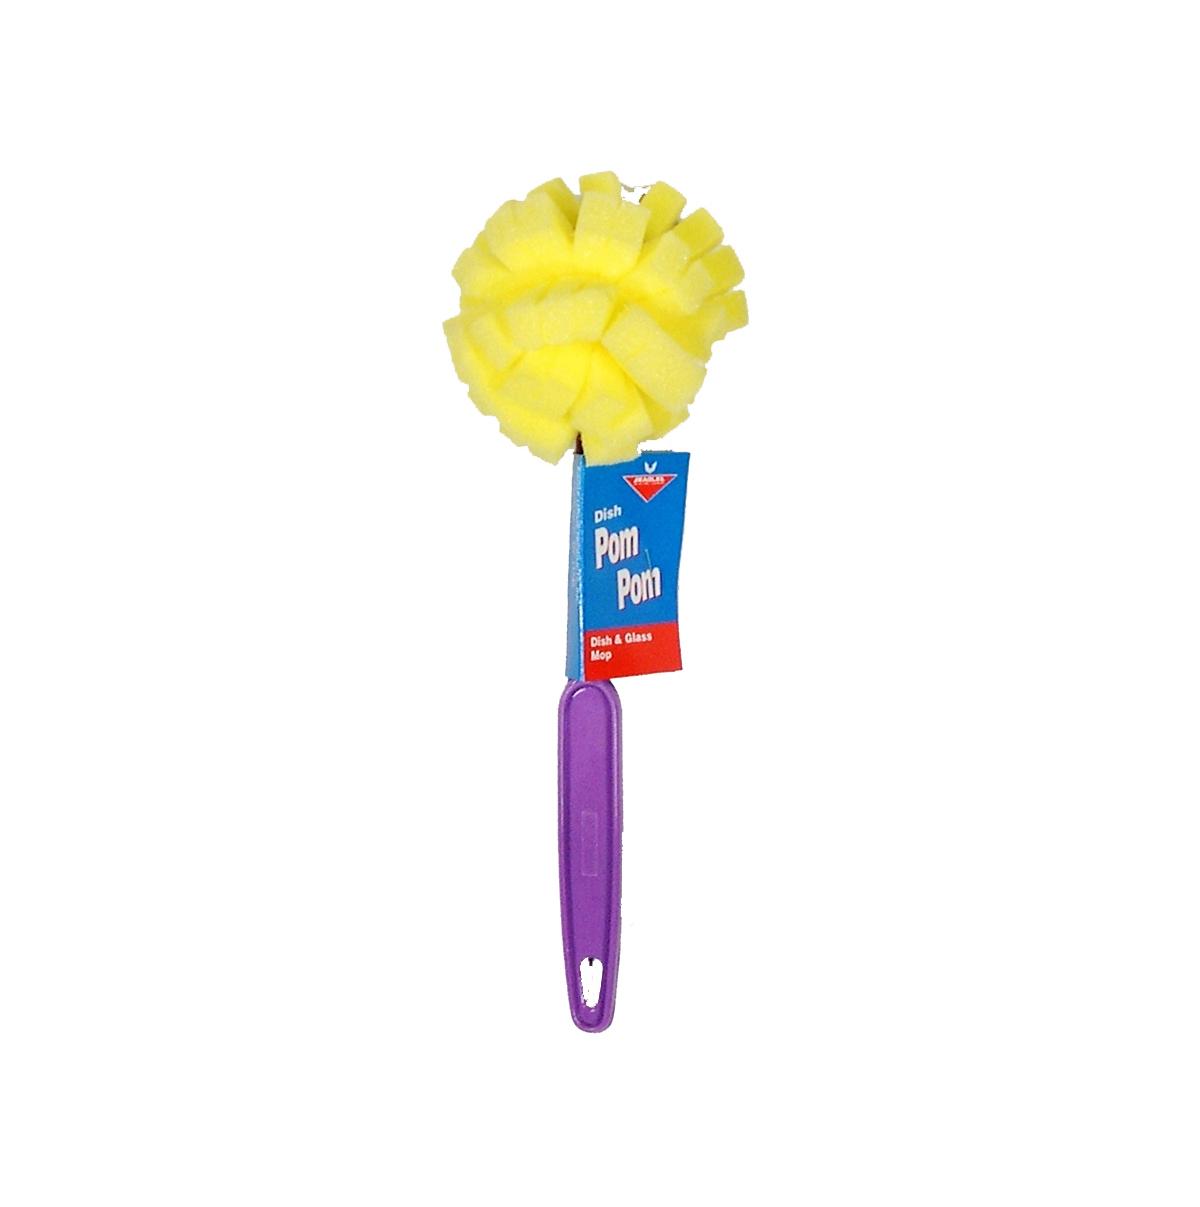 Wholesale Pom Dish Mop Sponge Sku 349208 Dollardays